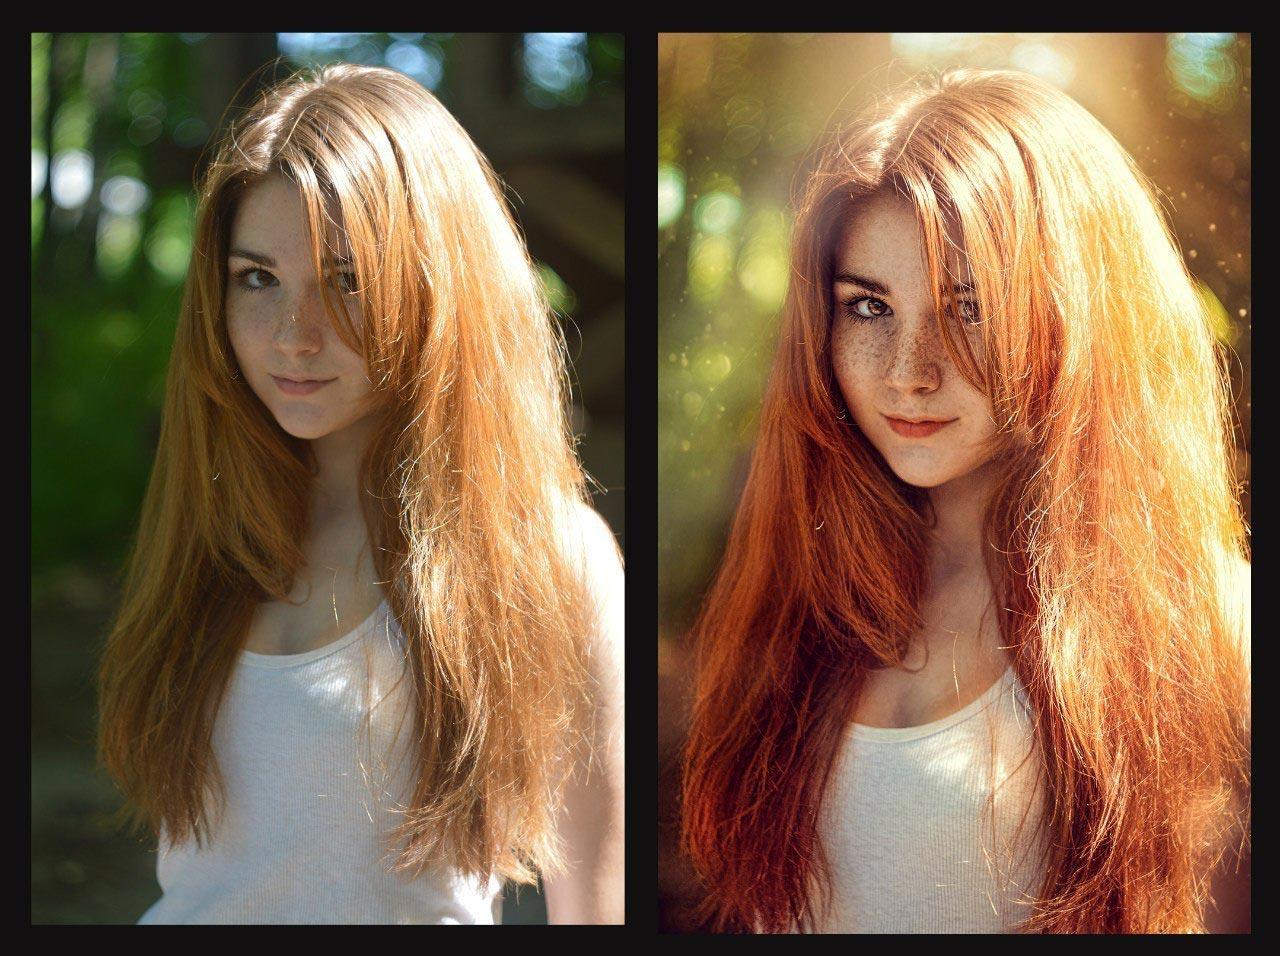 обработка фото цвет волос картинки